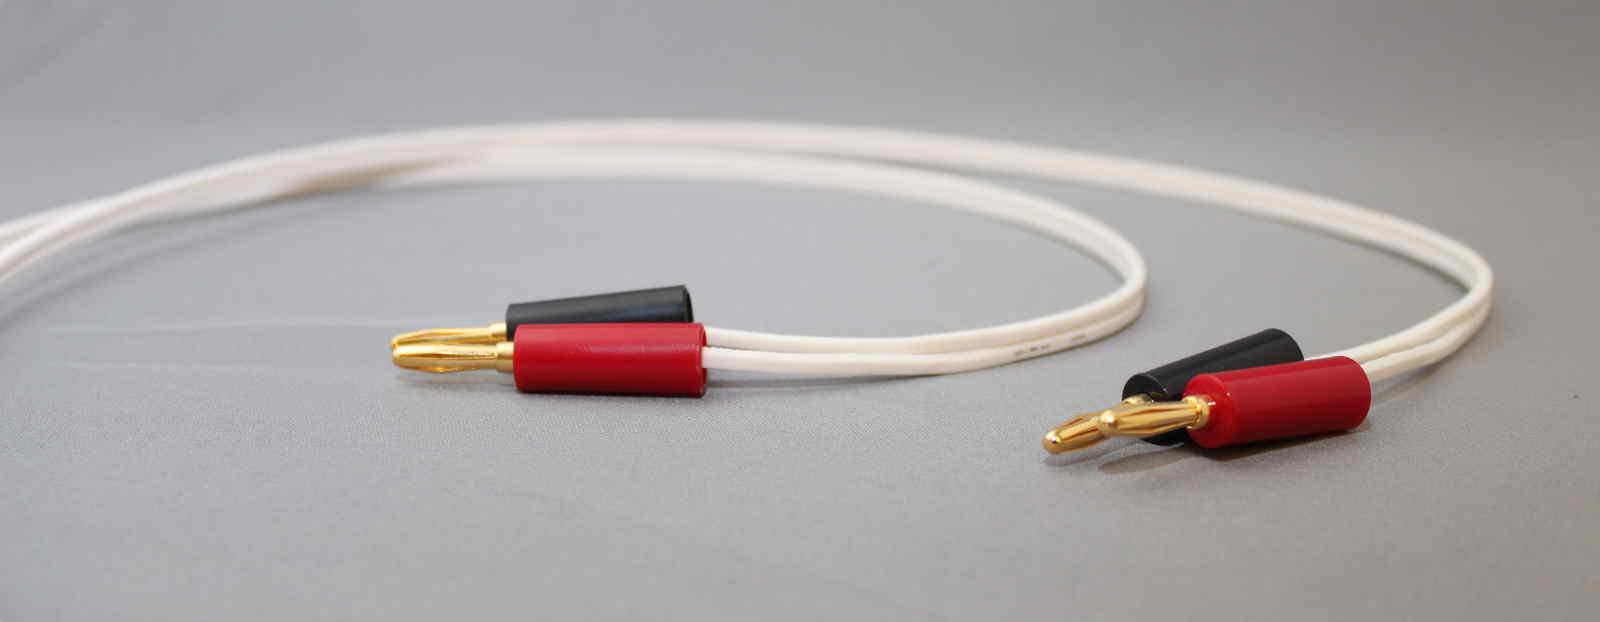 atlas element speaker cable terminated. Black Bedroom Furniture Sets. Home Design Ideas